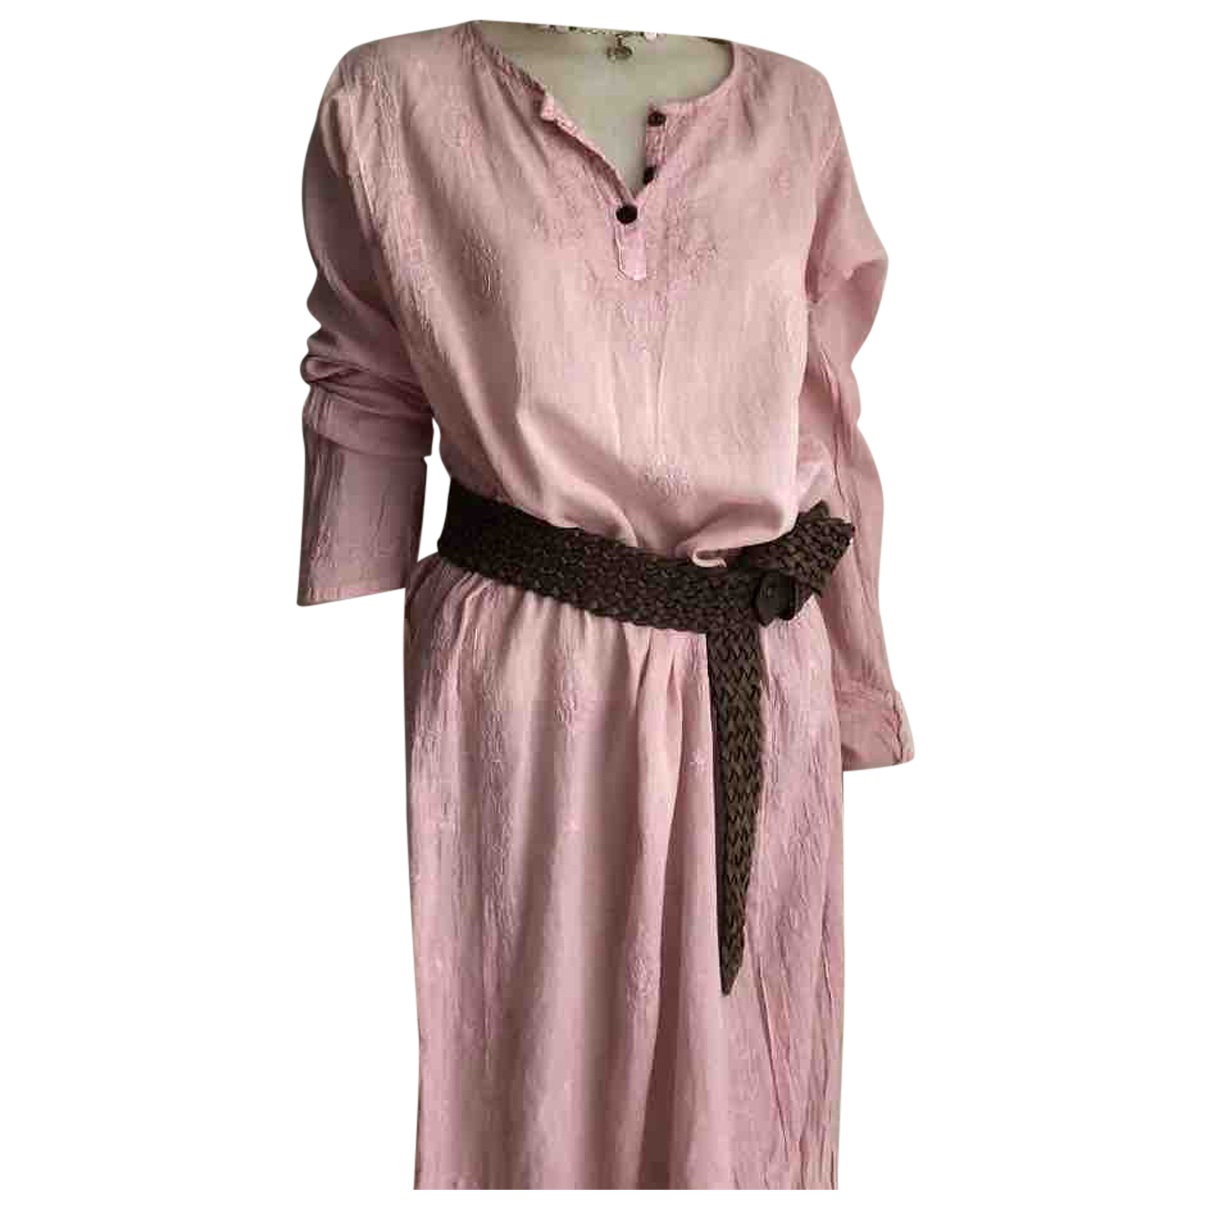 Autre Marque N Pink Cotton dress for Women One Size International